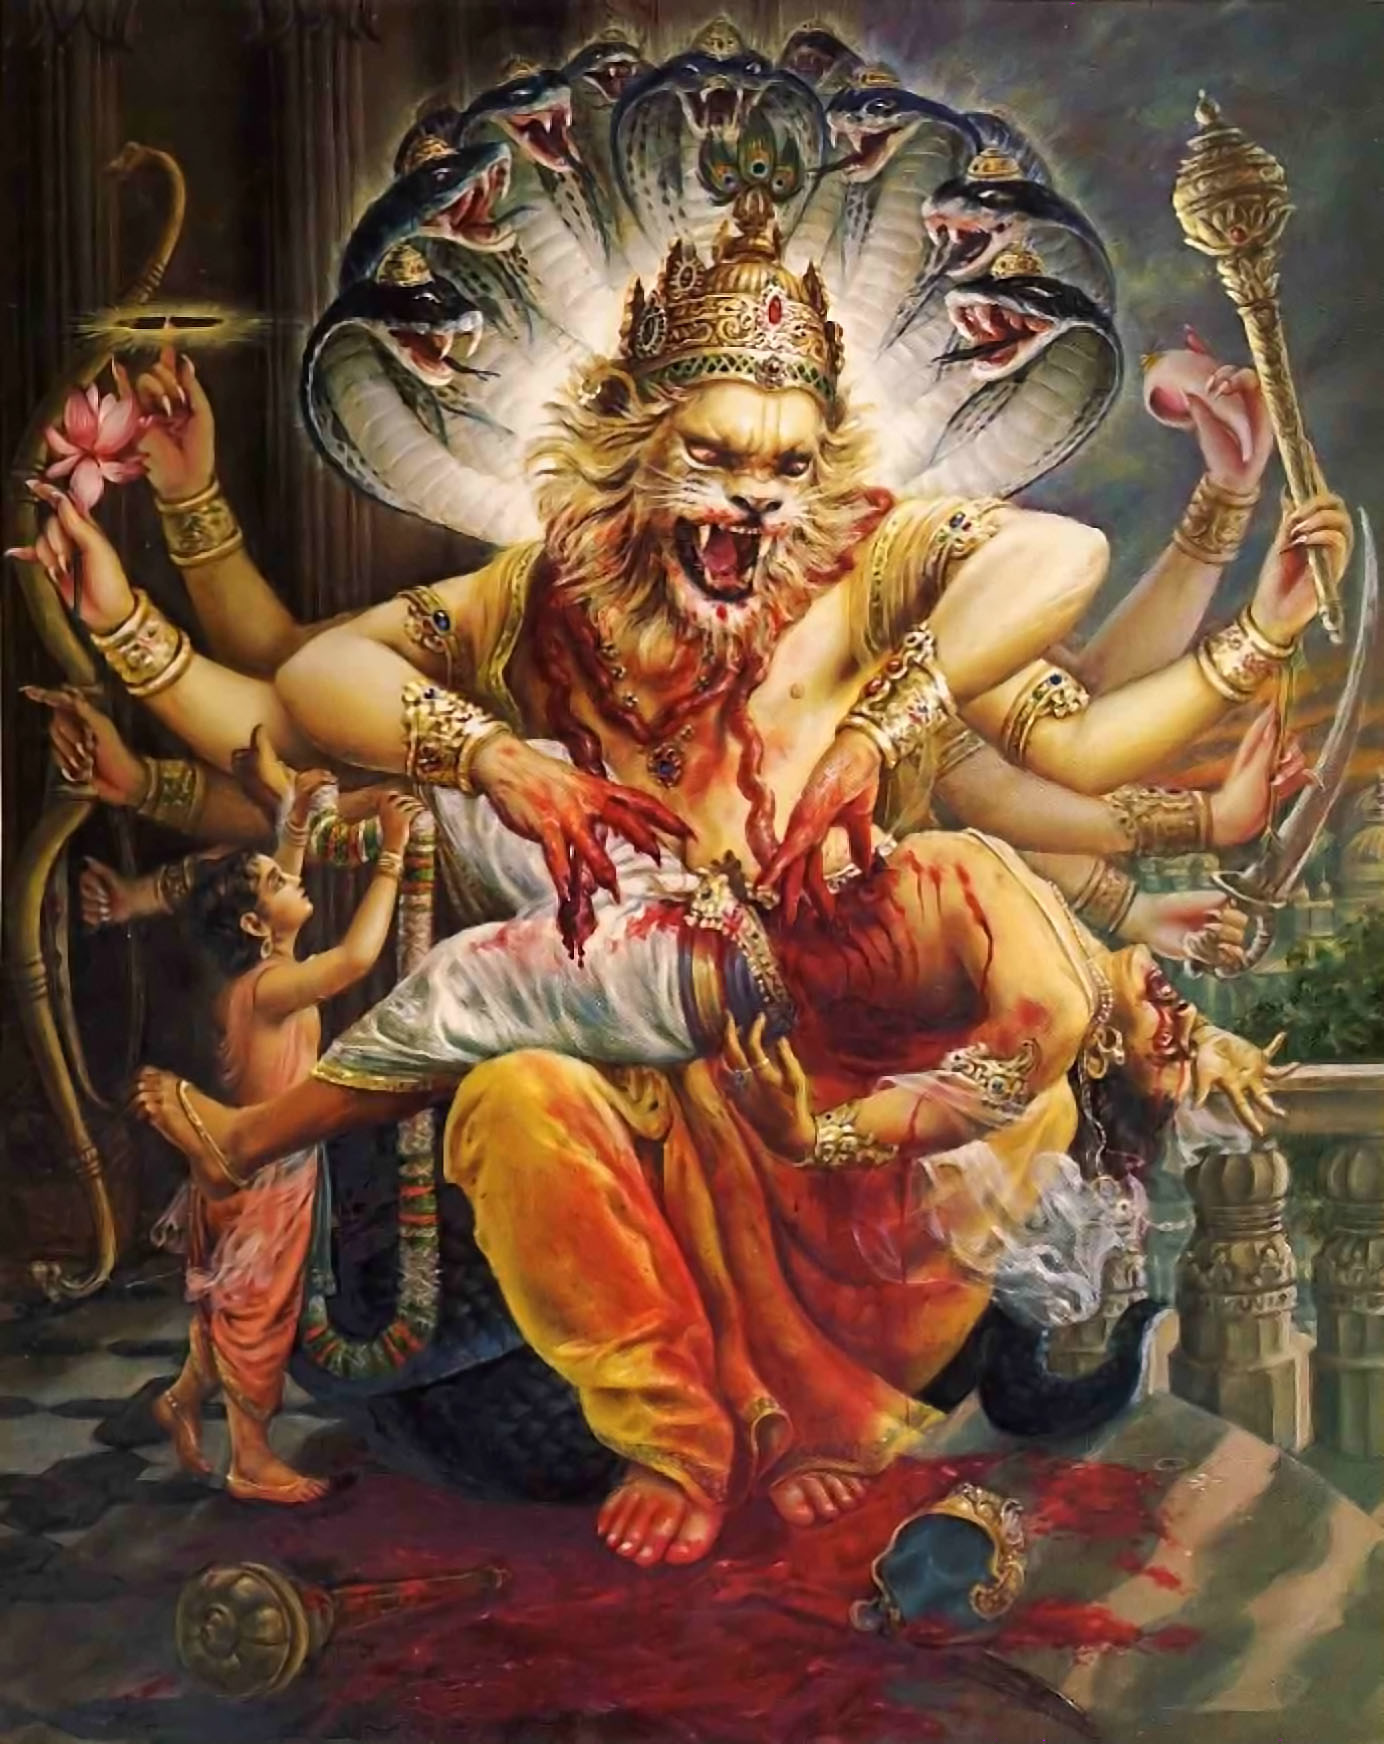 Lord Vishnu 3d Live Wallpaper Nrsimha The Hare Krishna Movement